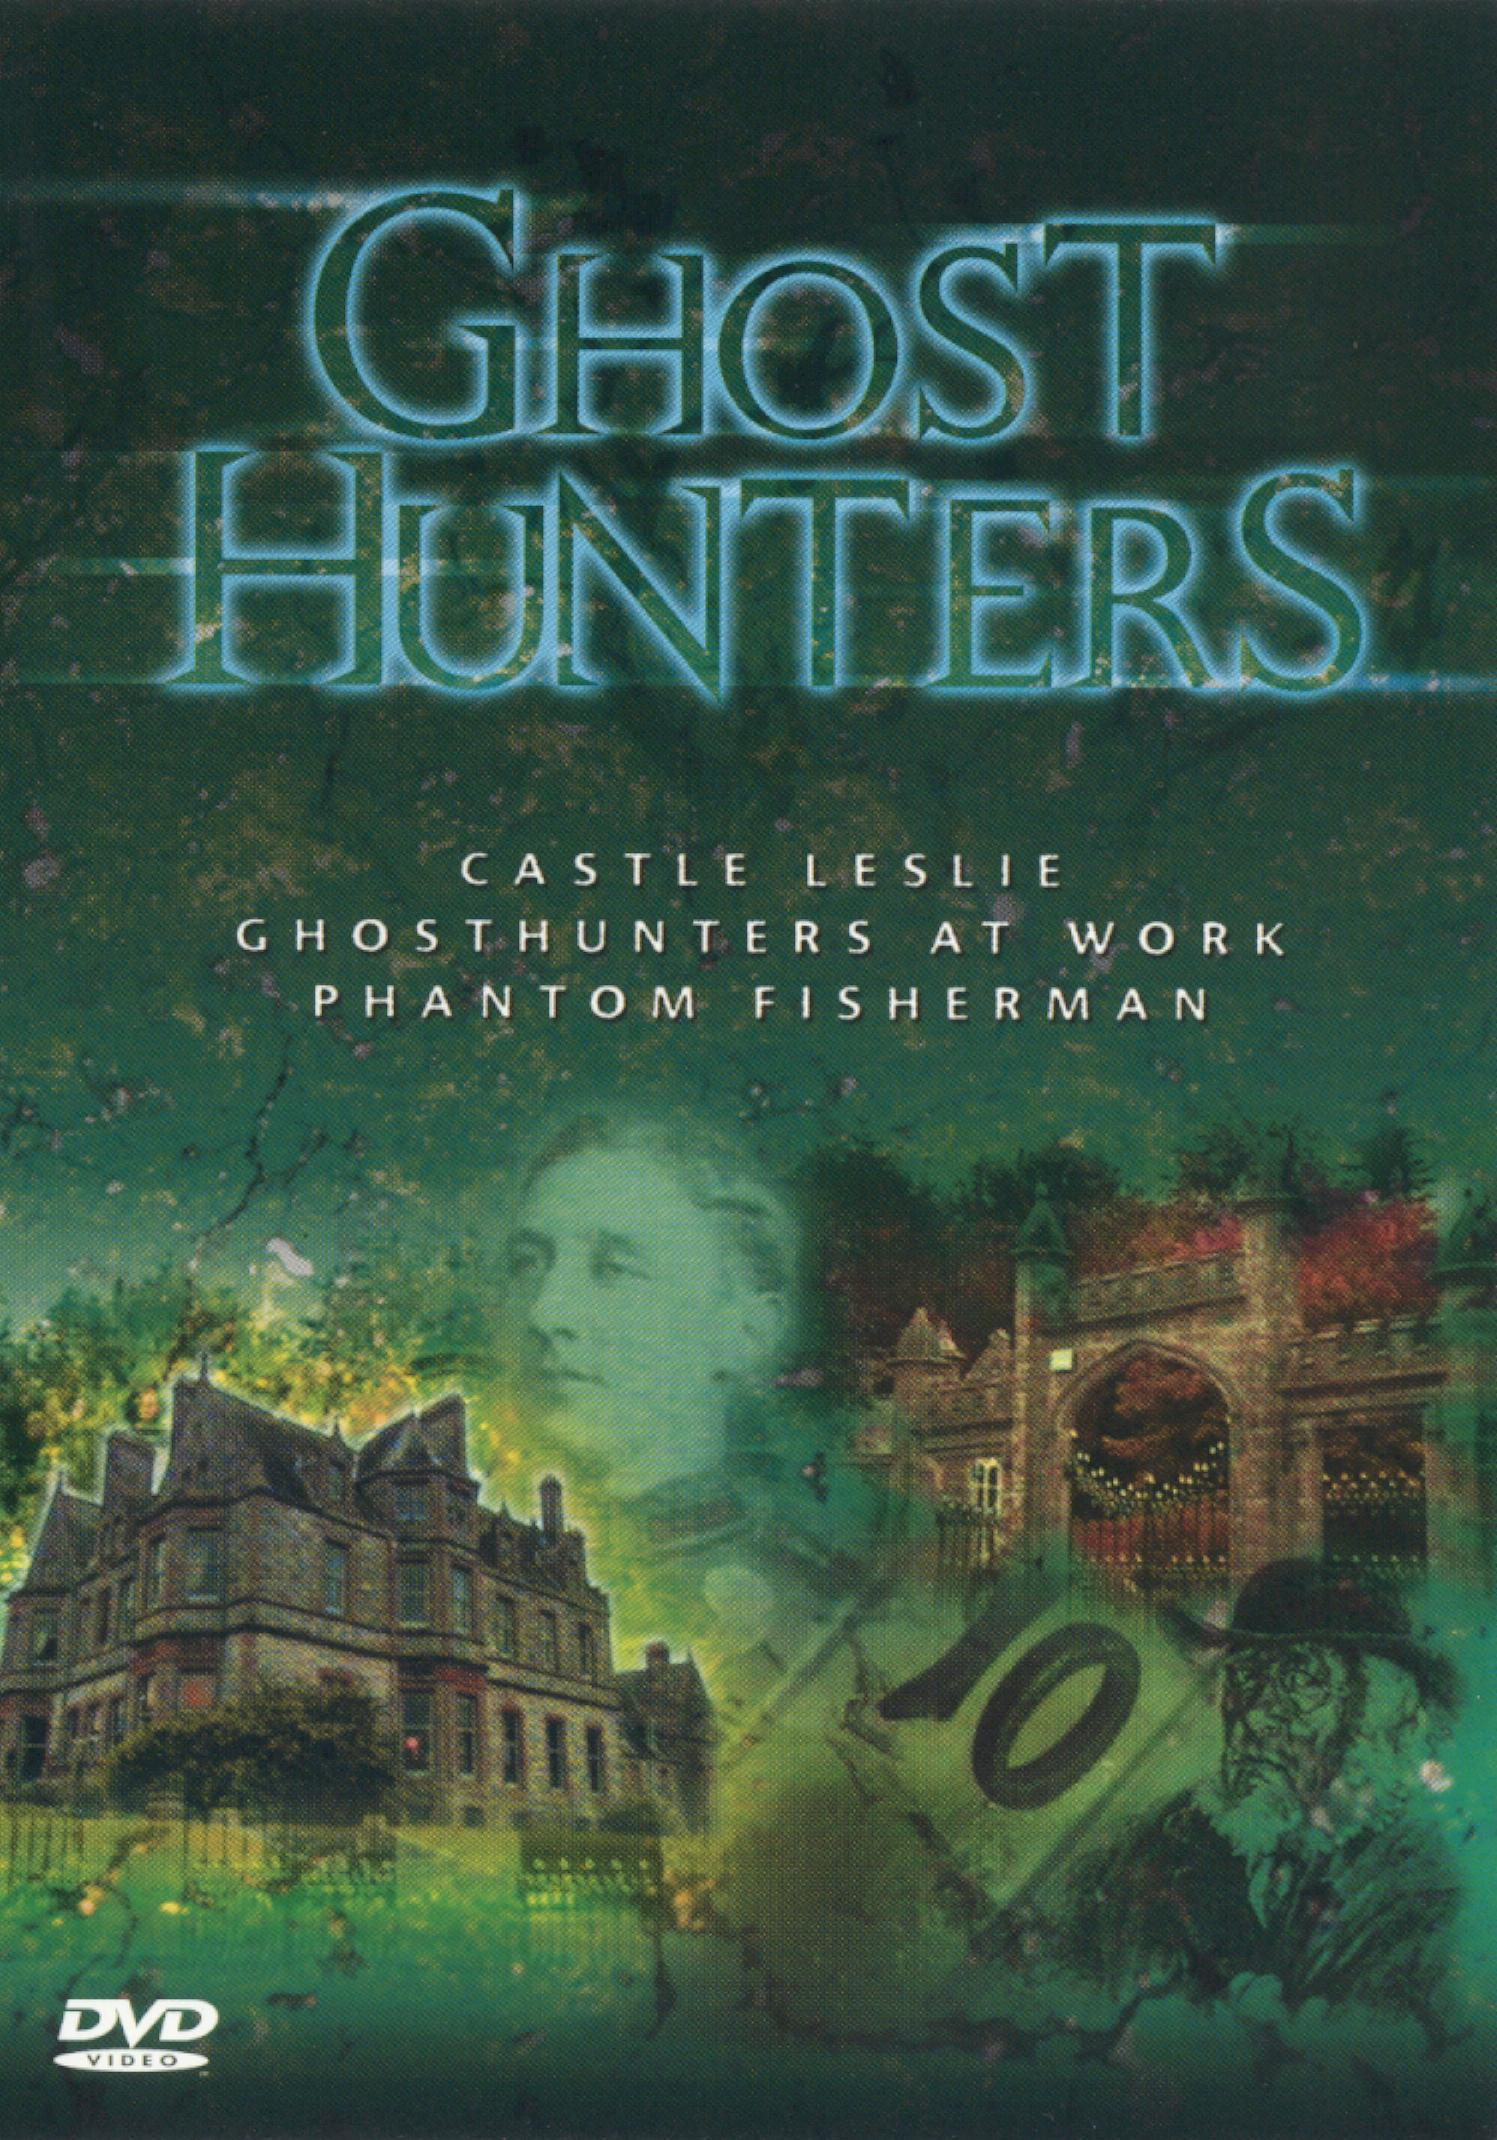 Ghost Hunters, Vol. 2